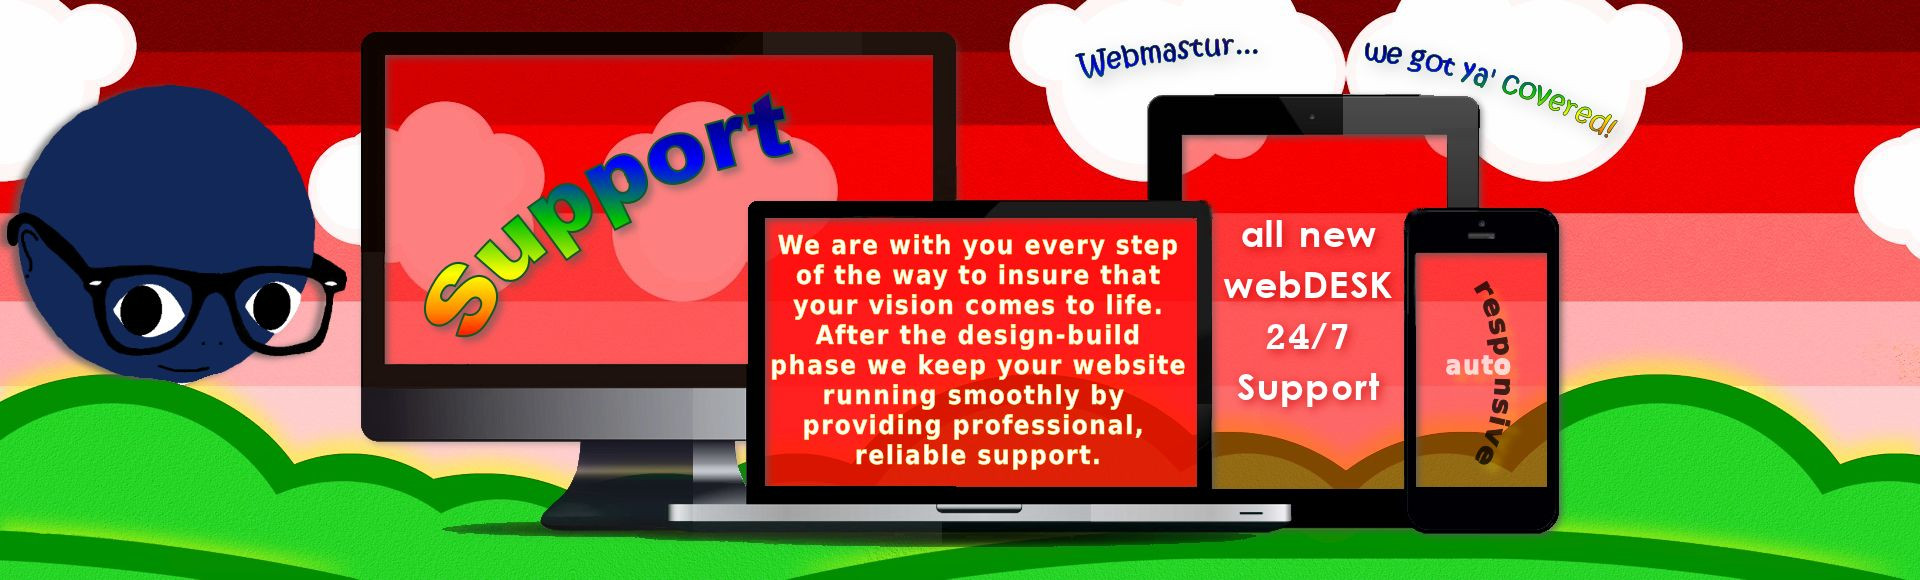 webmastur slides 3 support